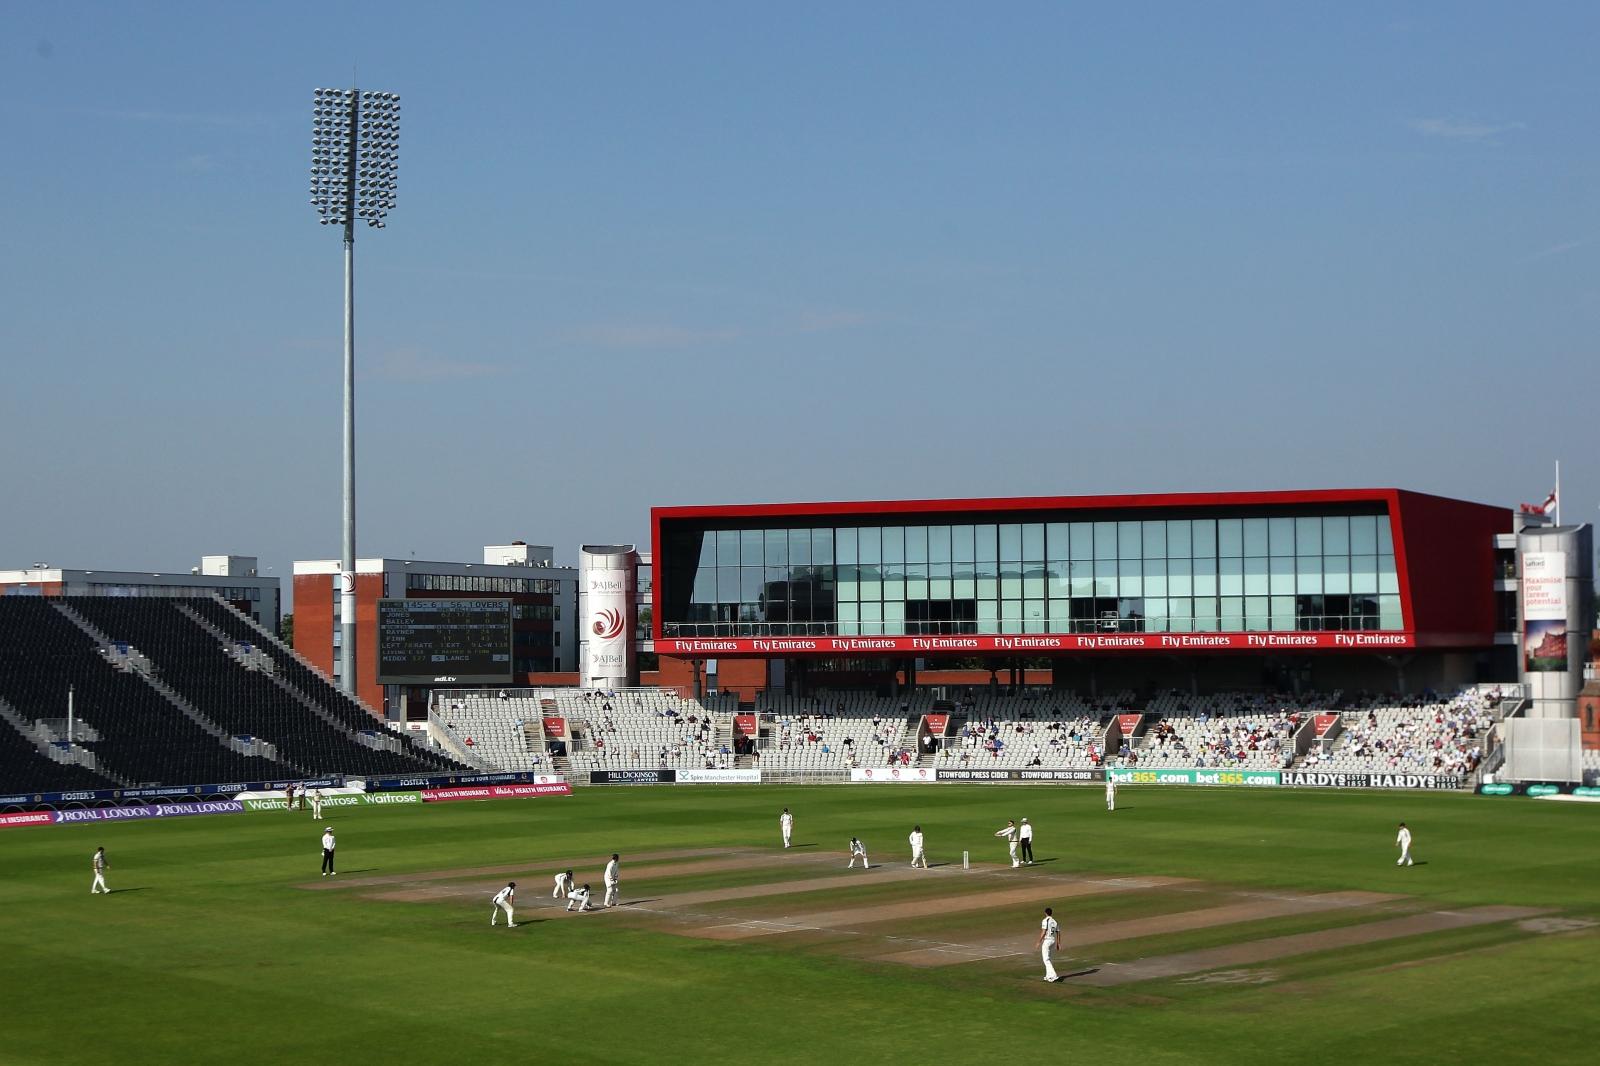 County cricket